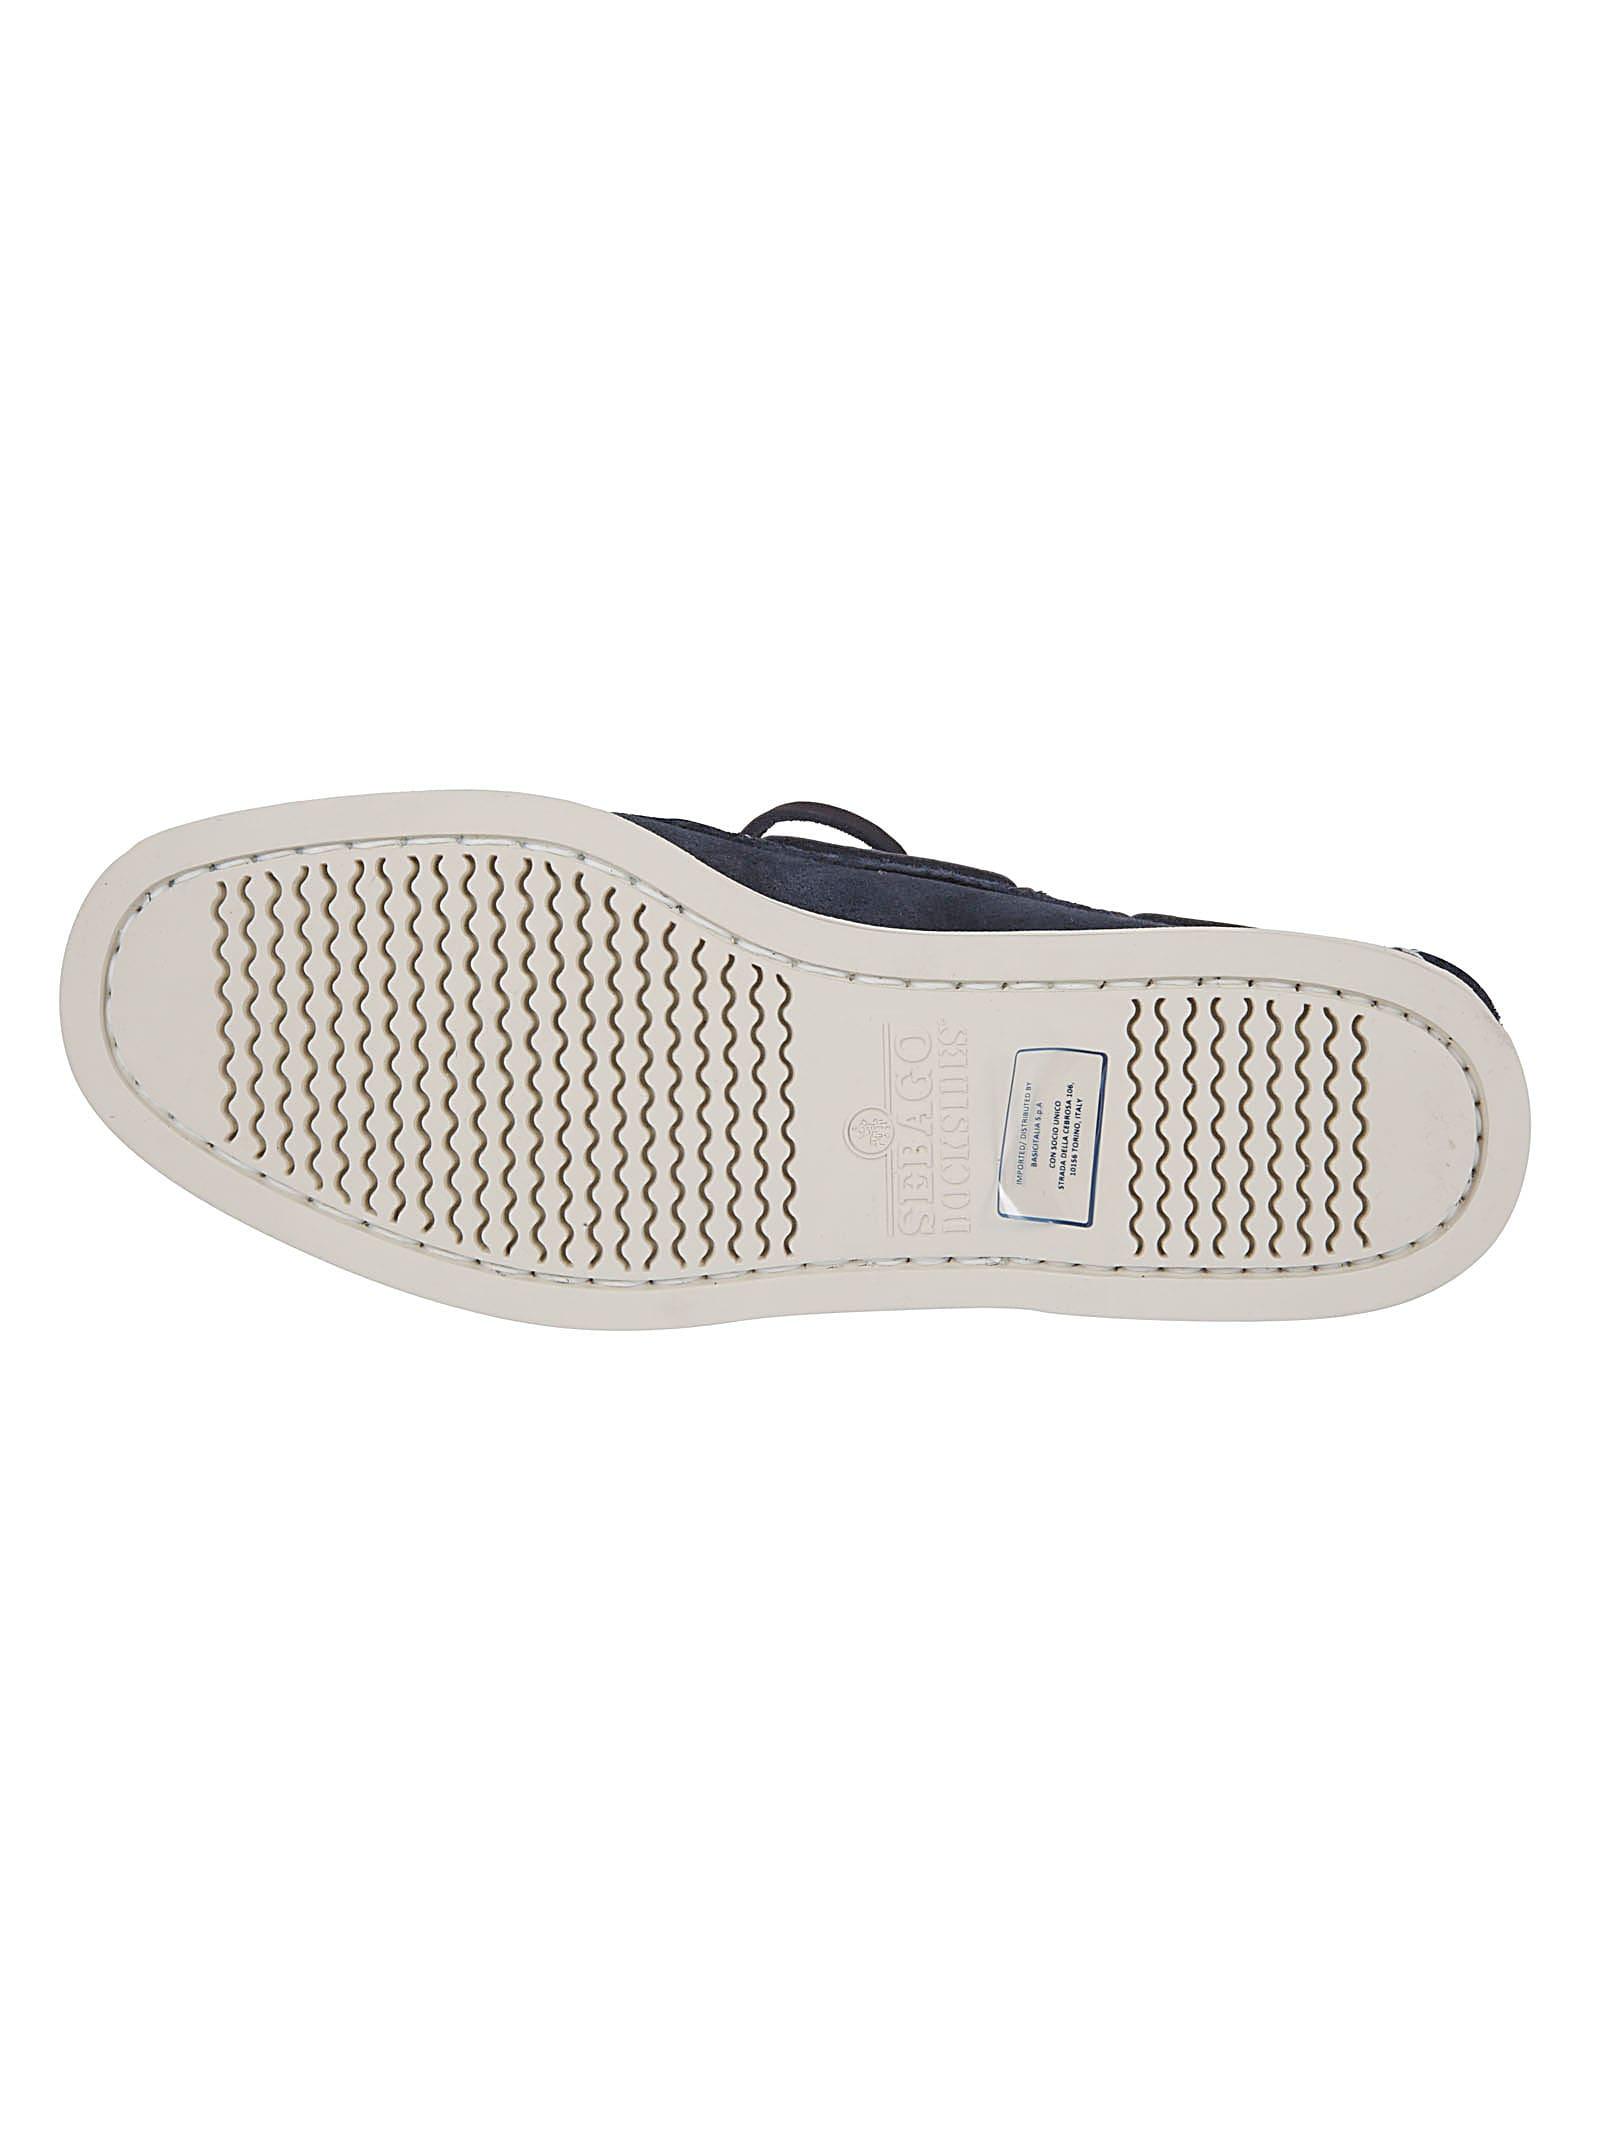 reputable site 279a3 427cc Sebago Sebago Logo Patch Boat Shoes - Blu navy - 10892163 ...